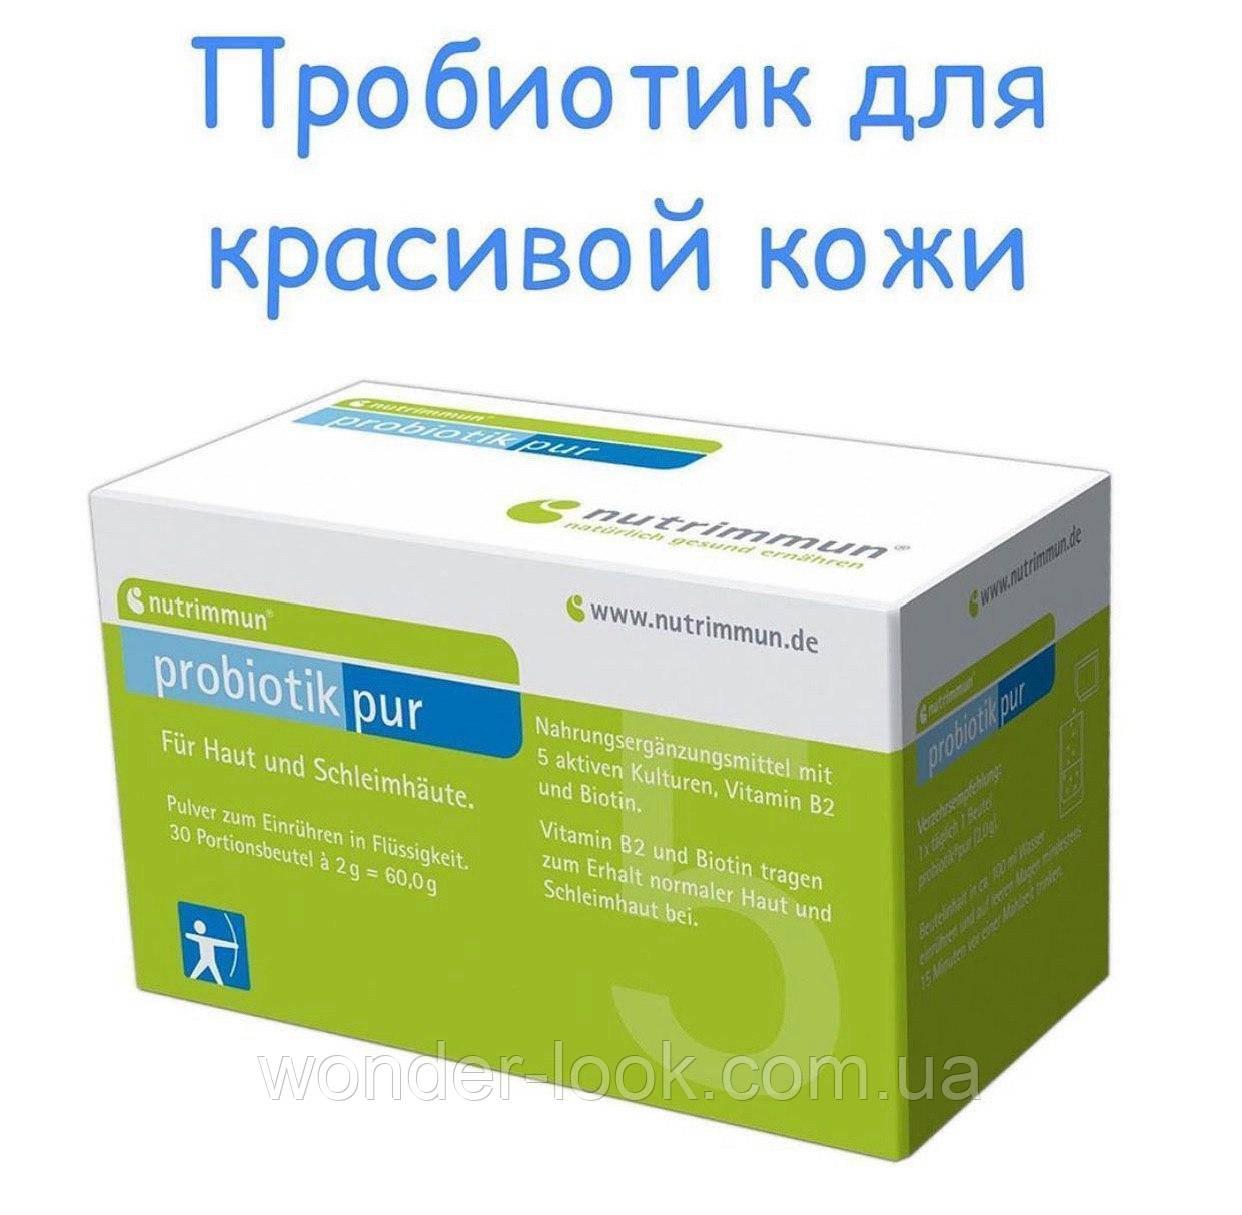 Probiotik pur nutrimmun пробиотик для красивой кожи Германия